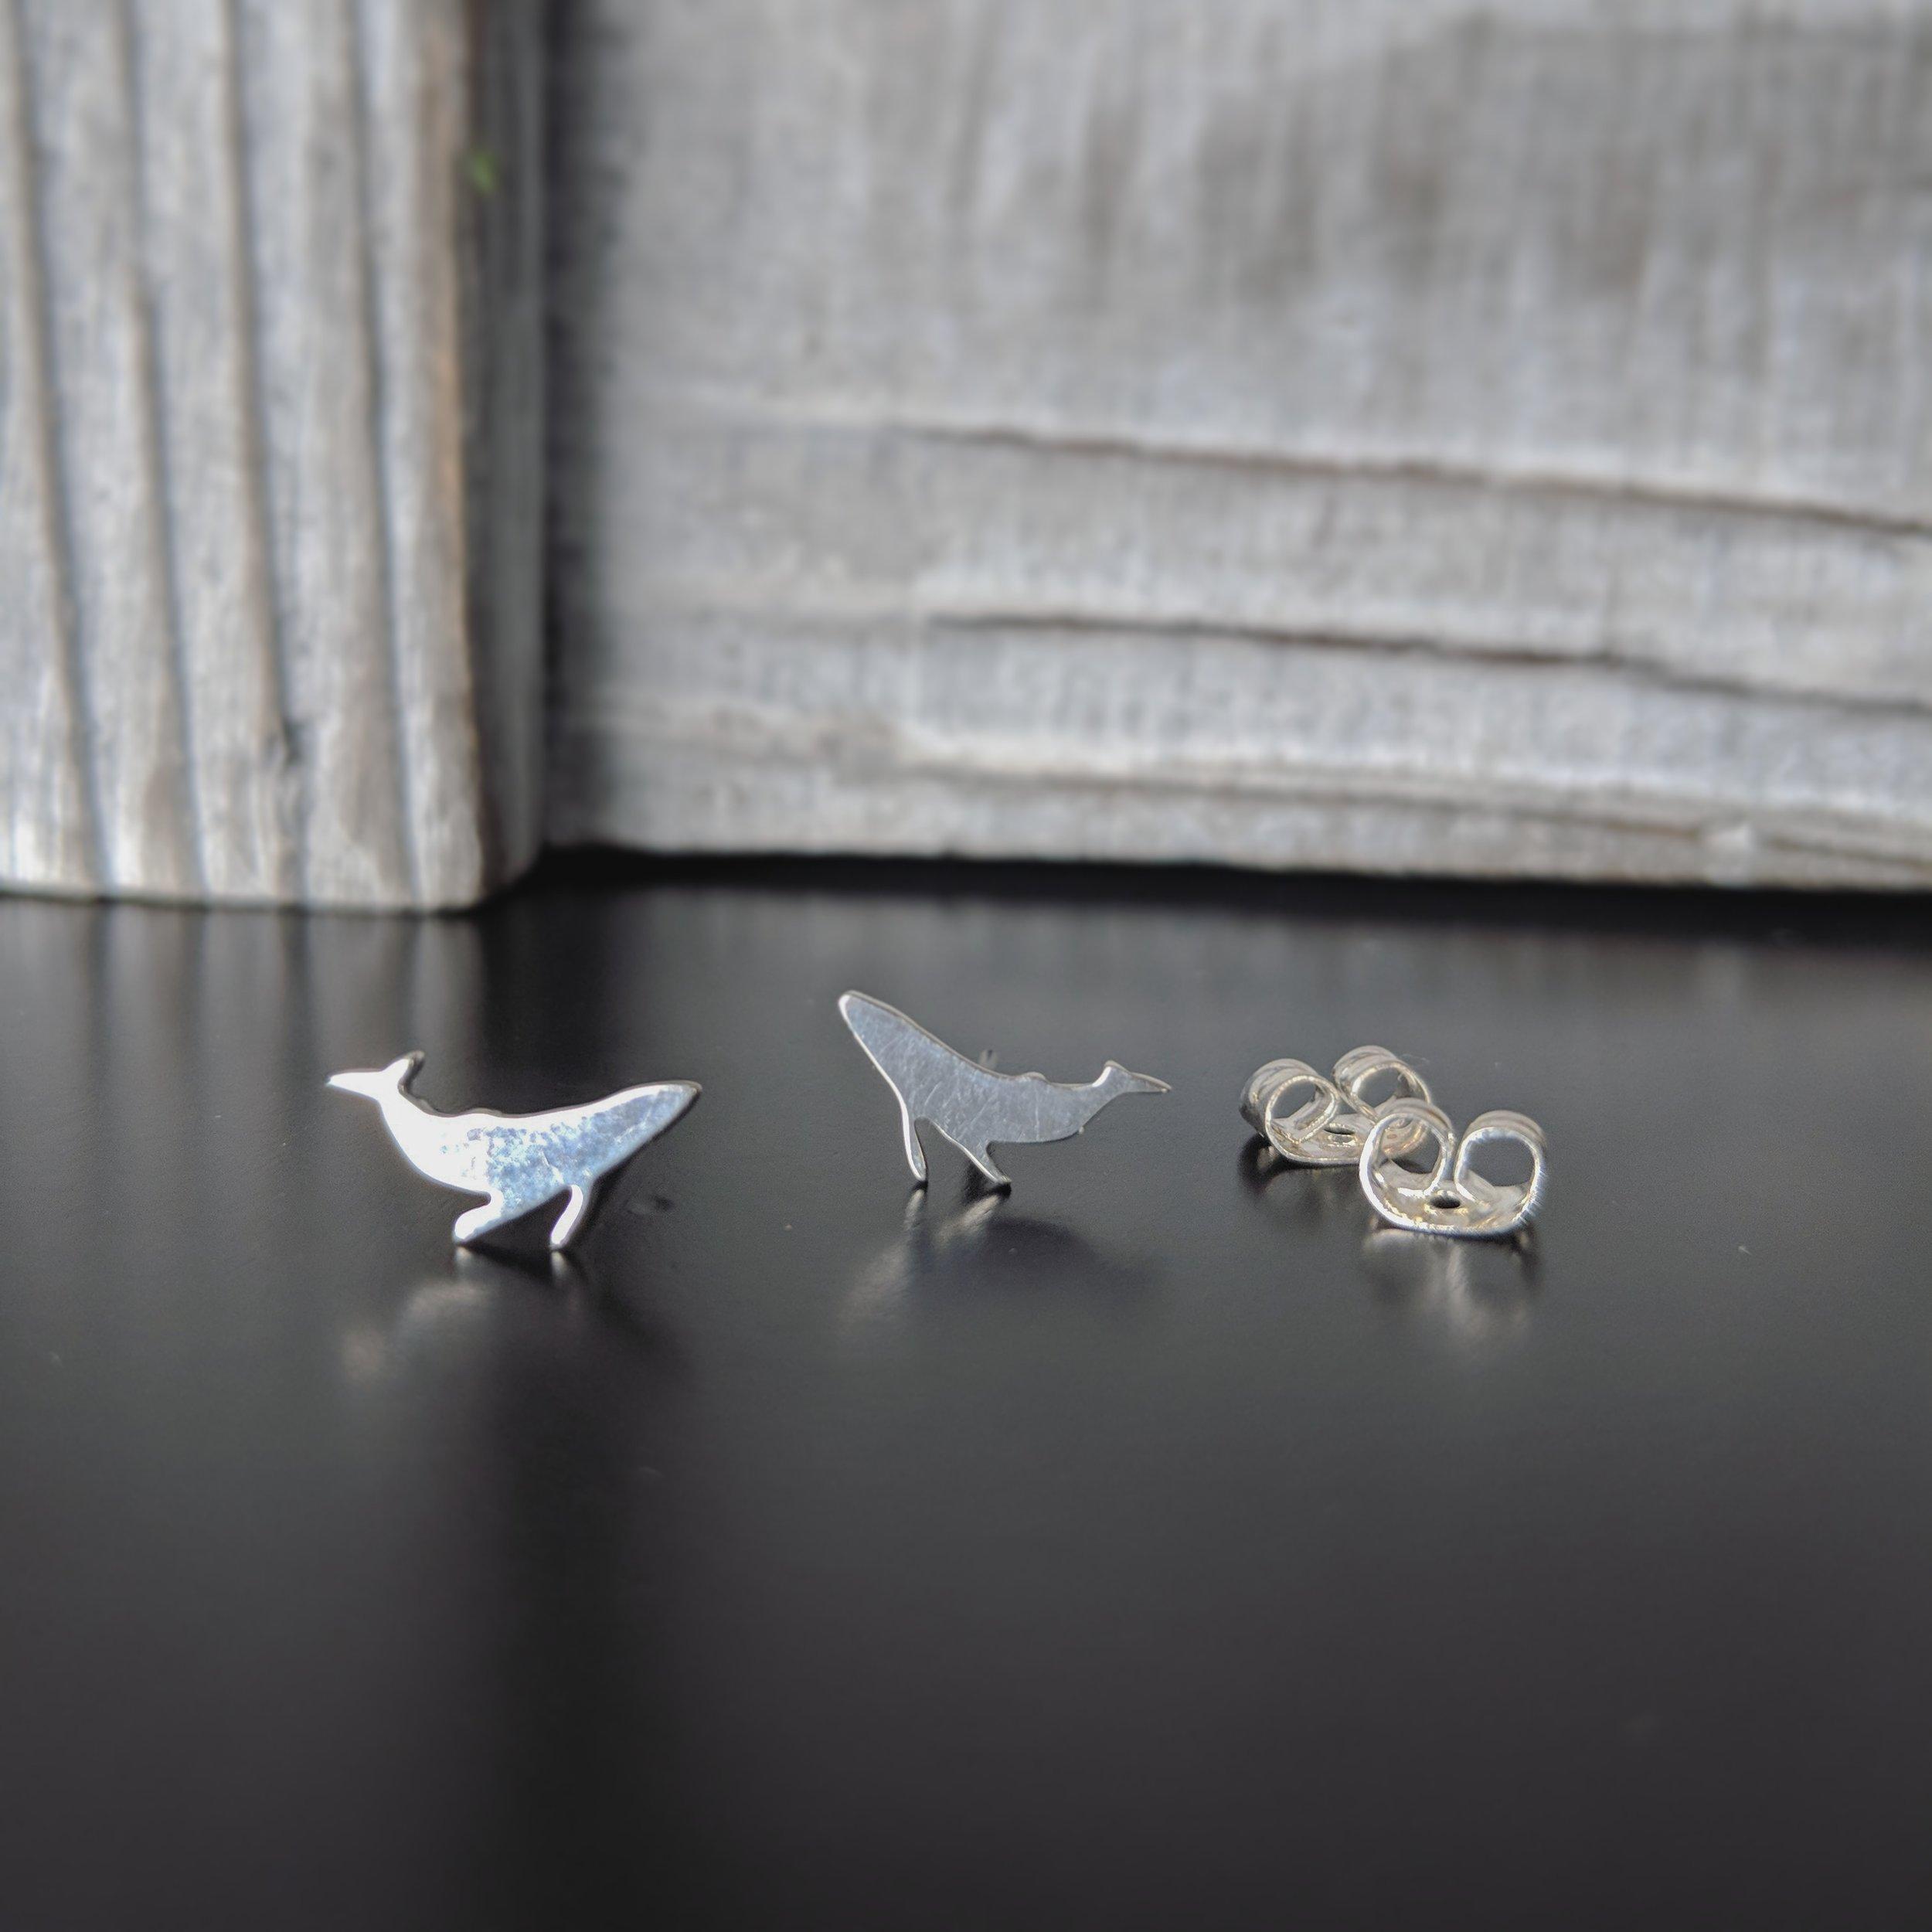 ckj-humpback-whale-wildlife-silver-studs-earrings.jpg